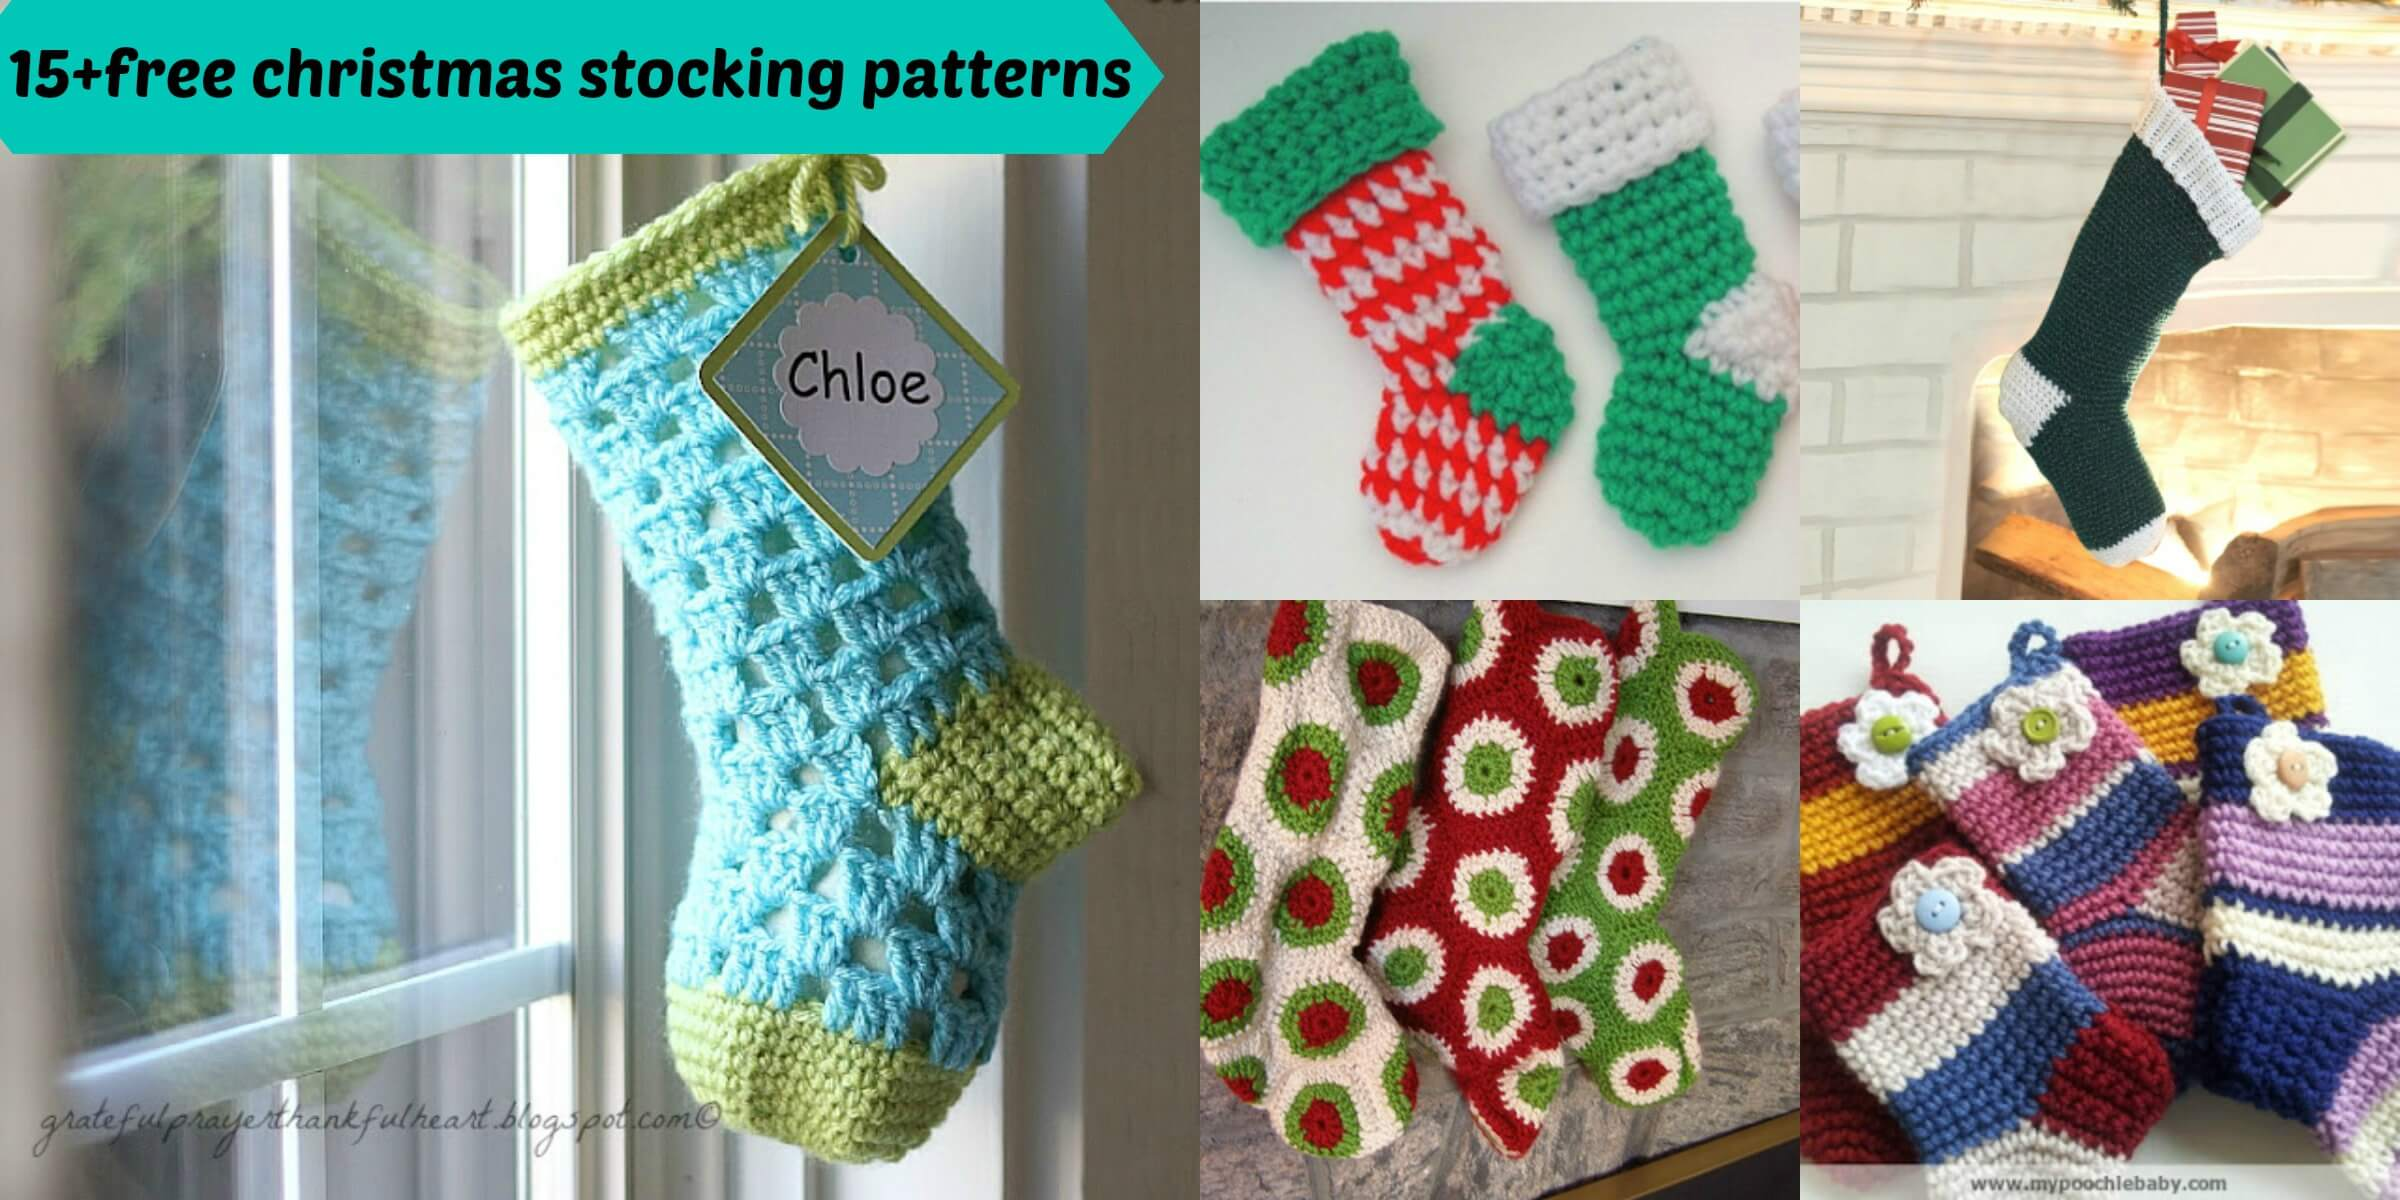 15+free crochet christmas stocking patterns